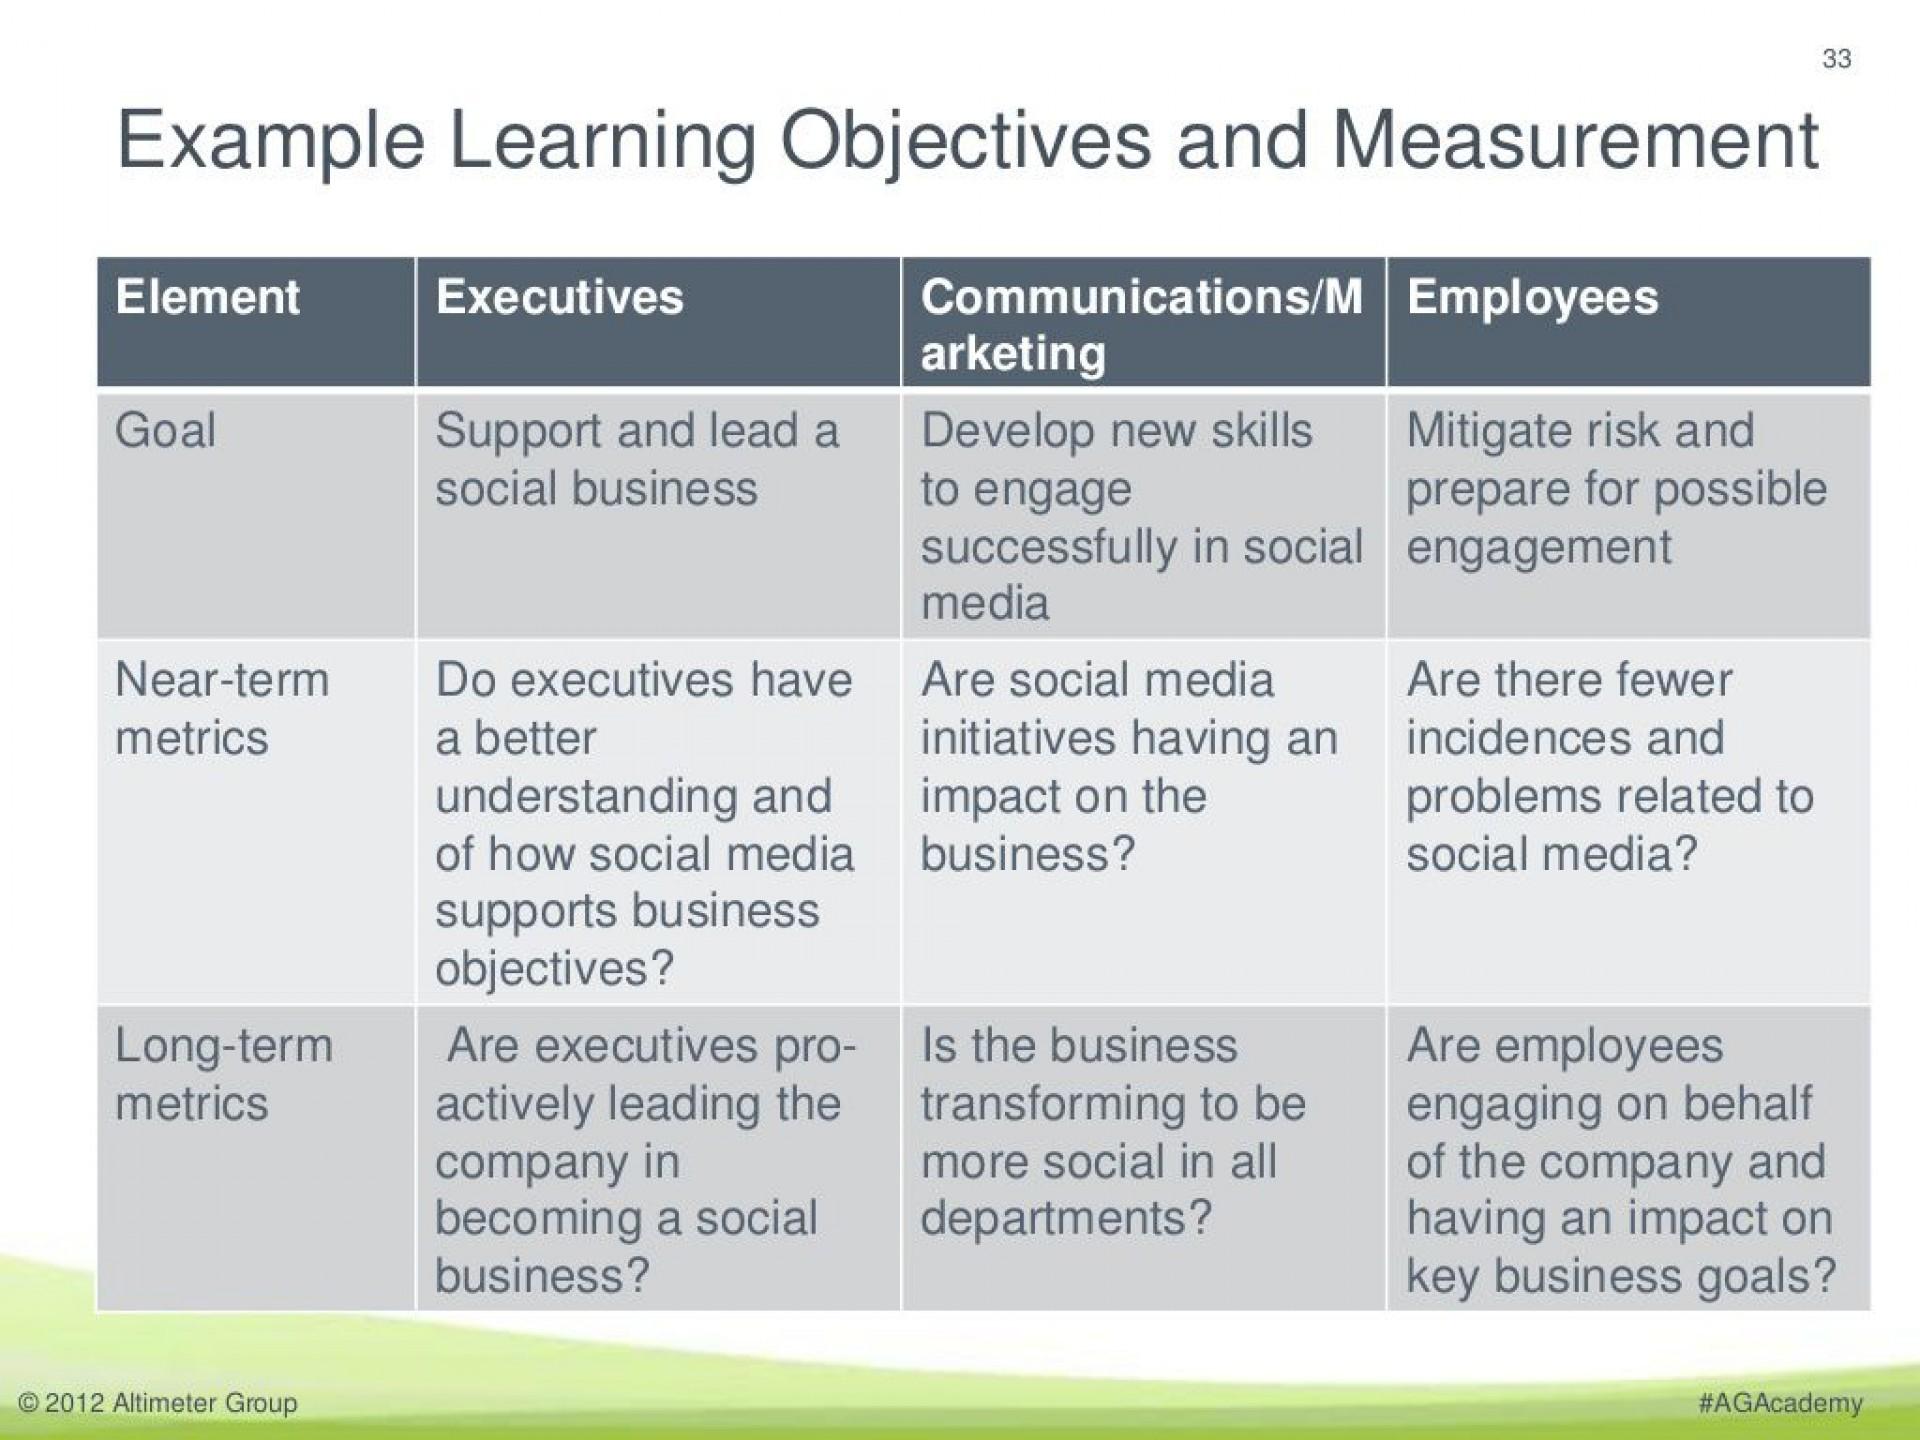 009 Incredible Employee Development Plan Goal Example Inspiration  Examples1920